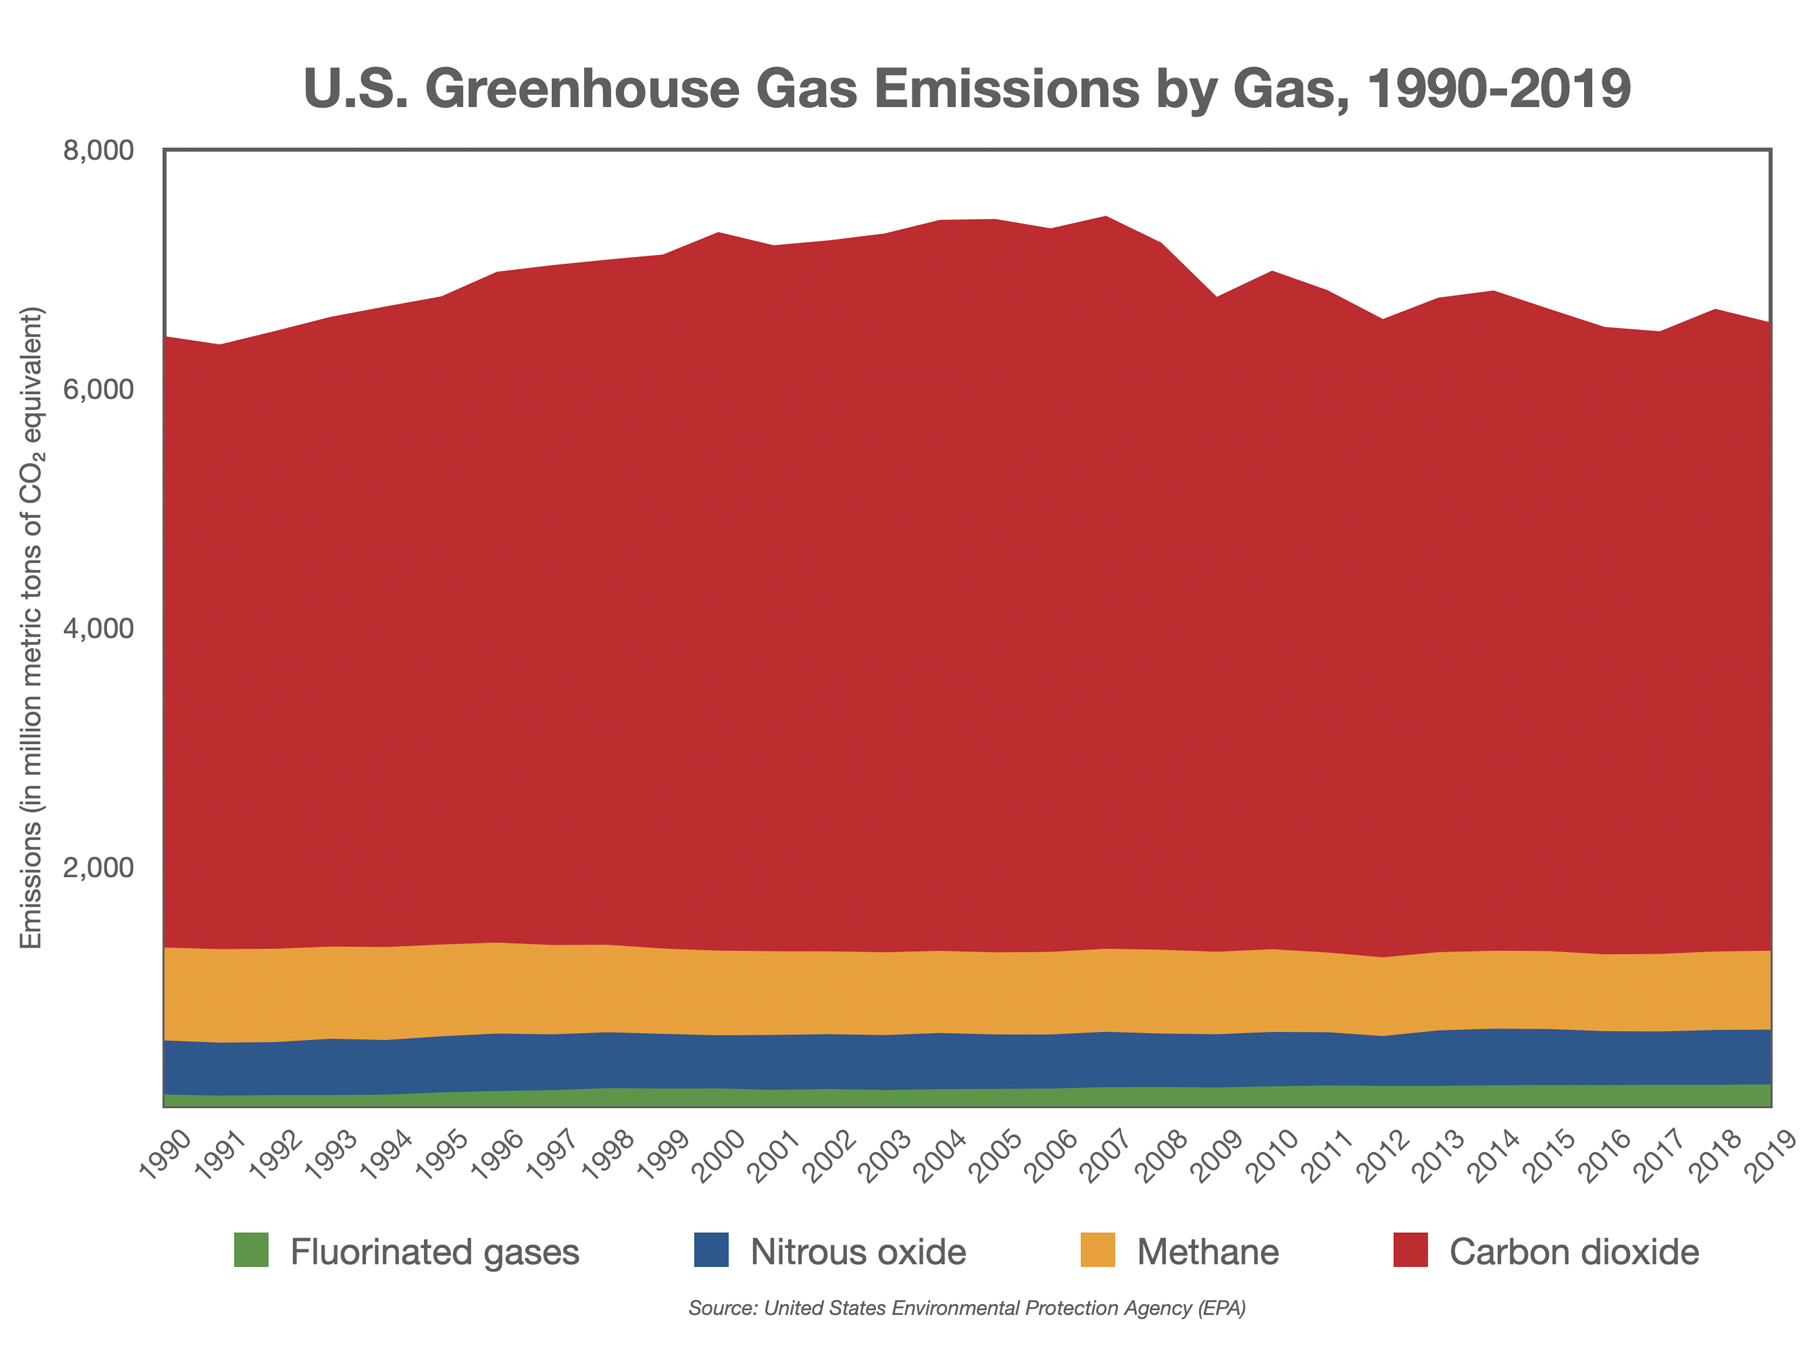 U.S. Greenhouse Gas Emissions by Gas, 1990-2019